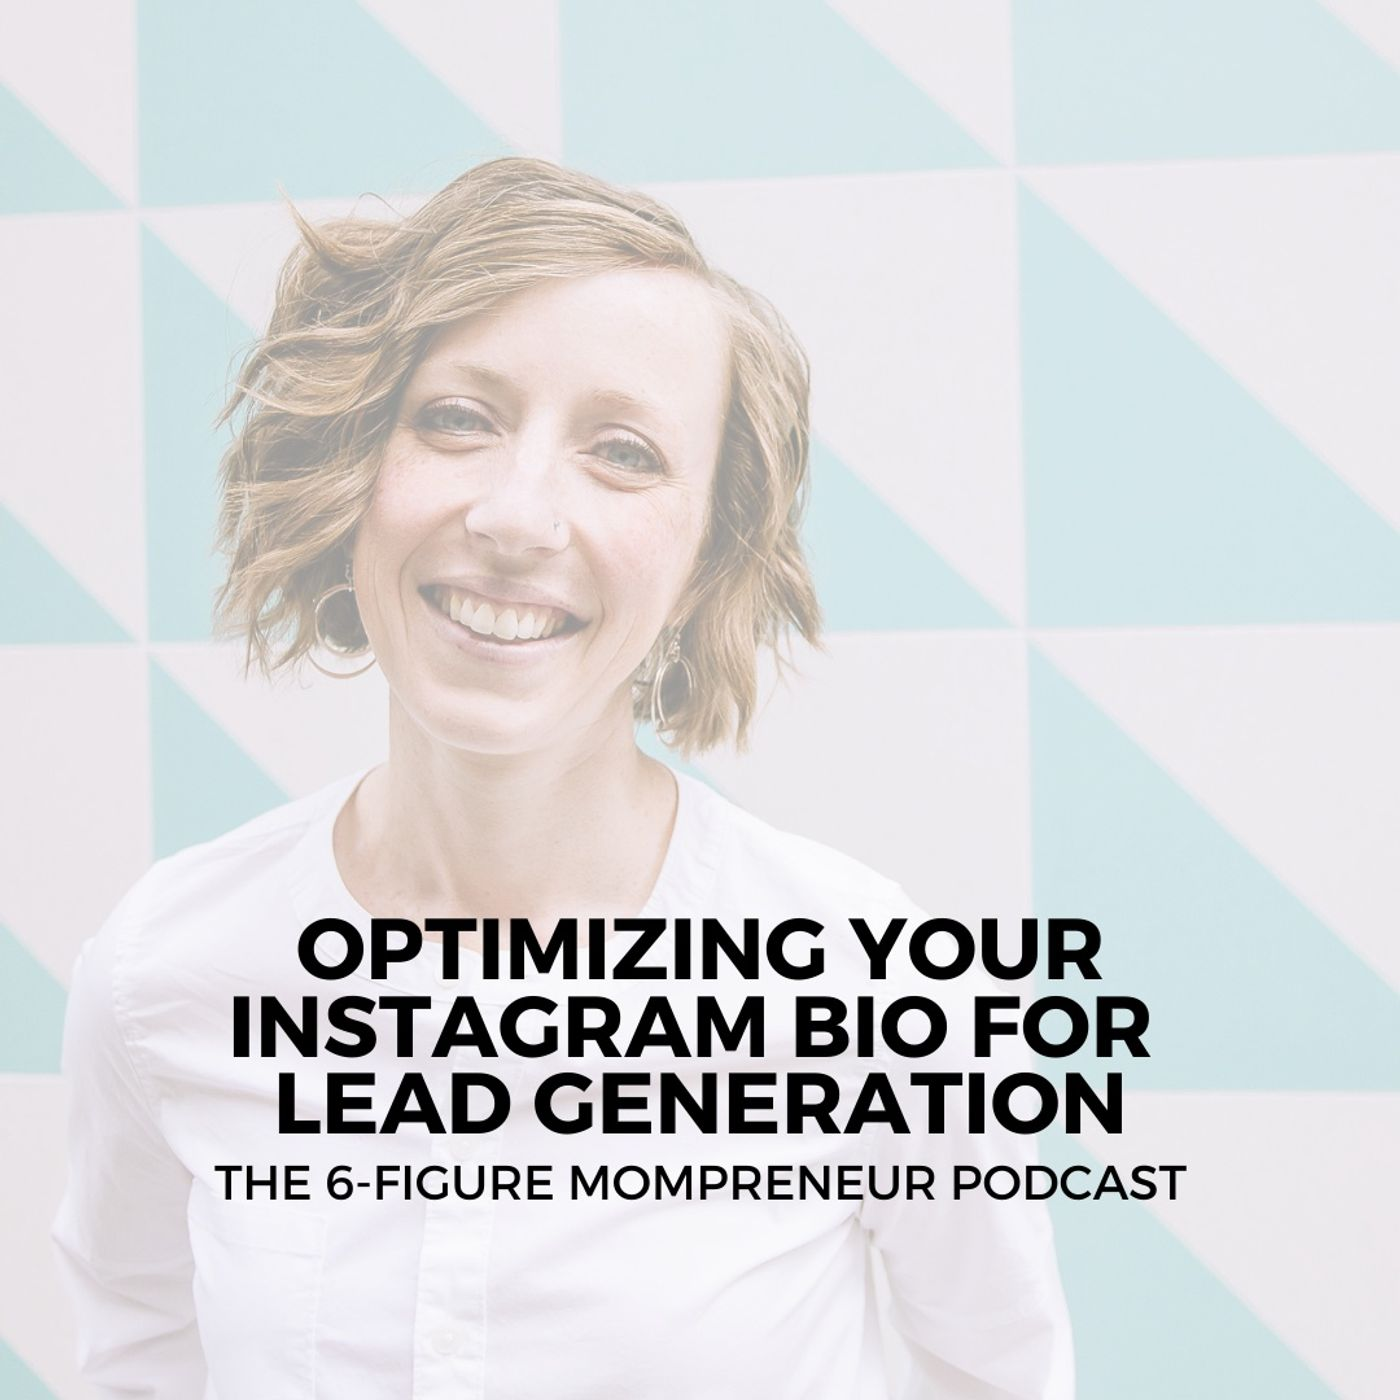 Optimizing your Instagram bio for lead generation